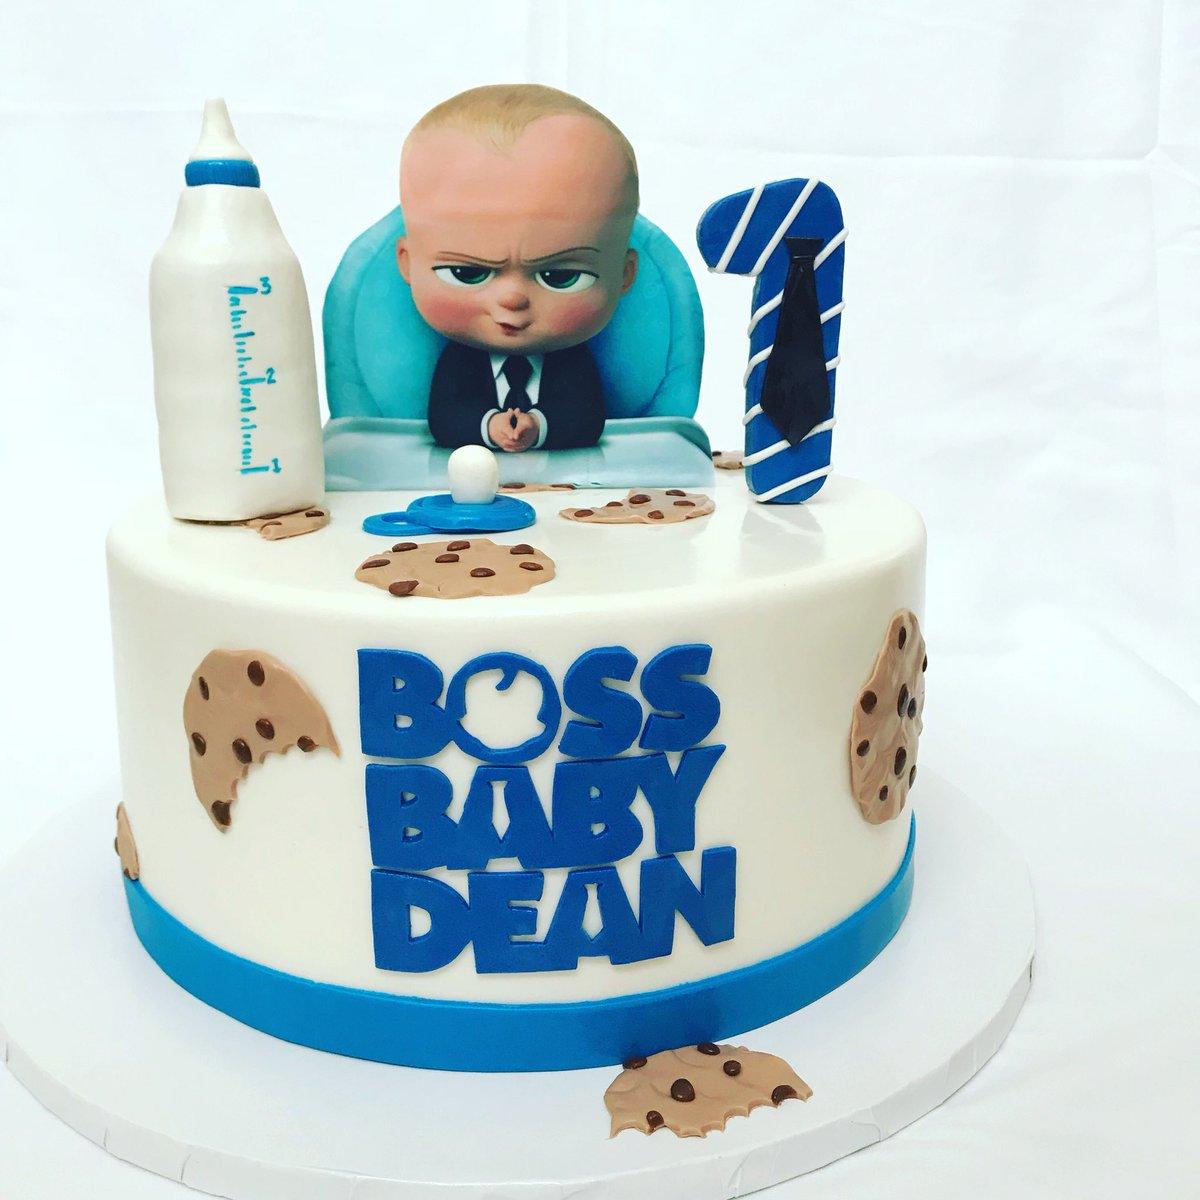 Seydas Cakes On Twitter Happy Birthday Boss Baby Dean